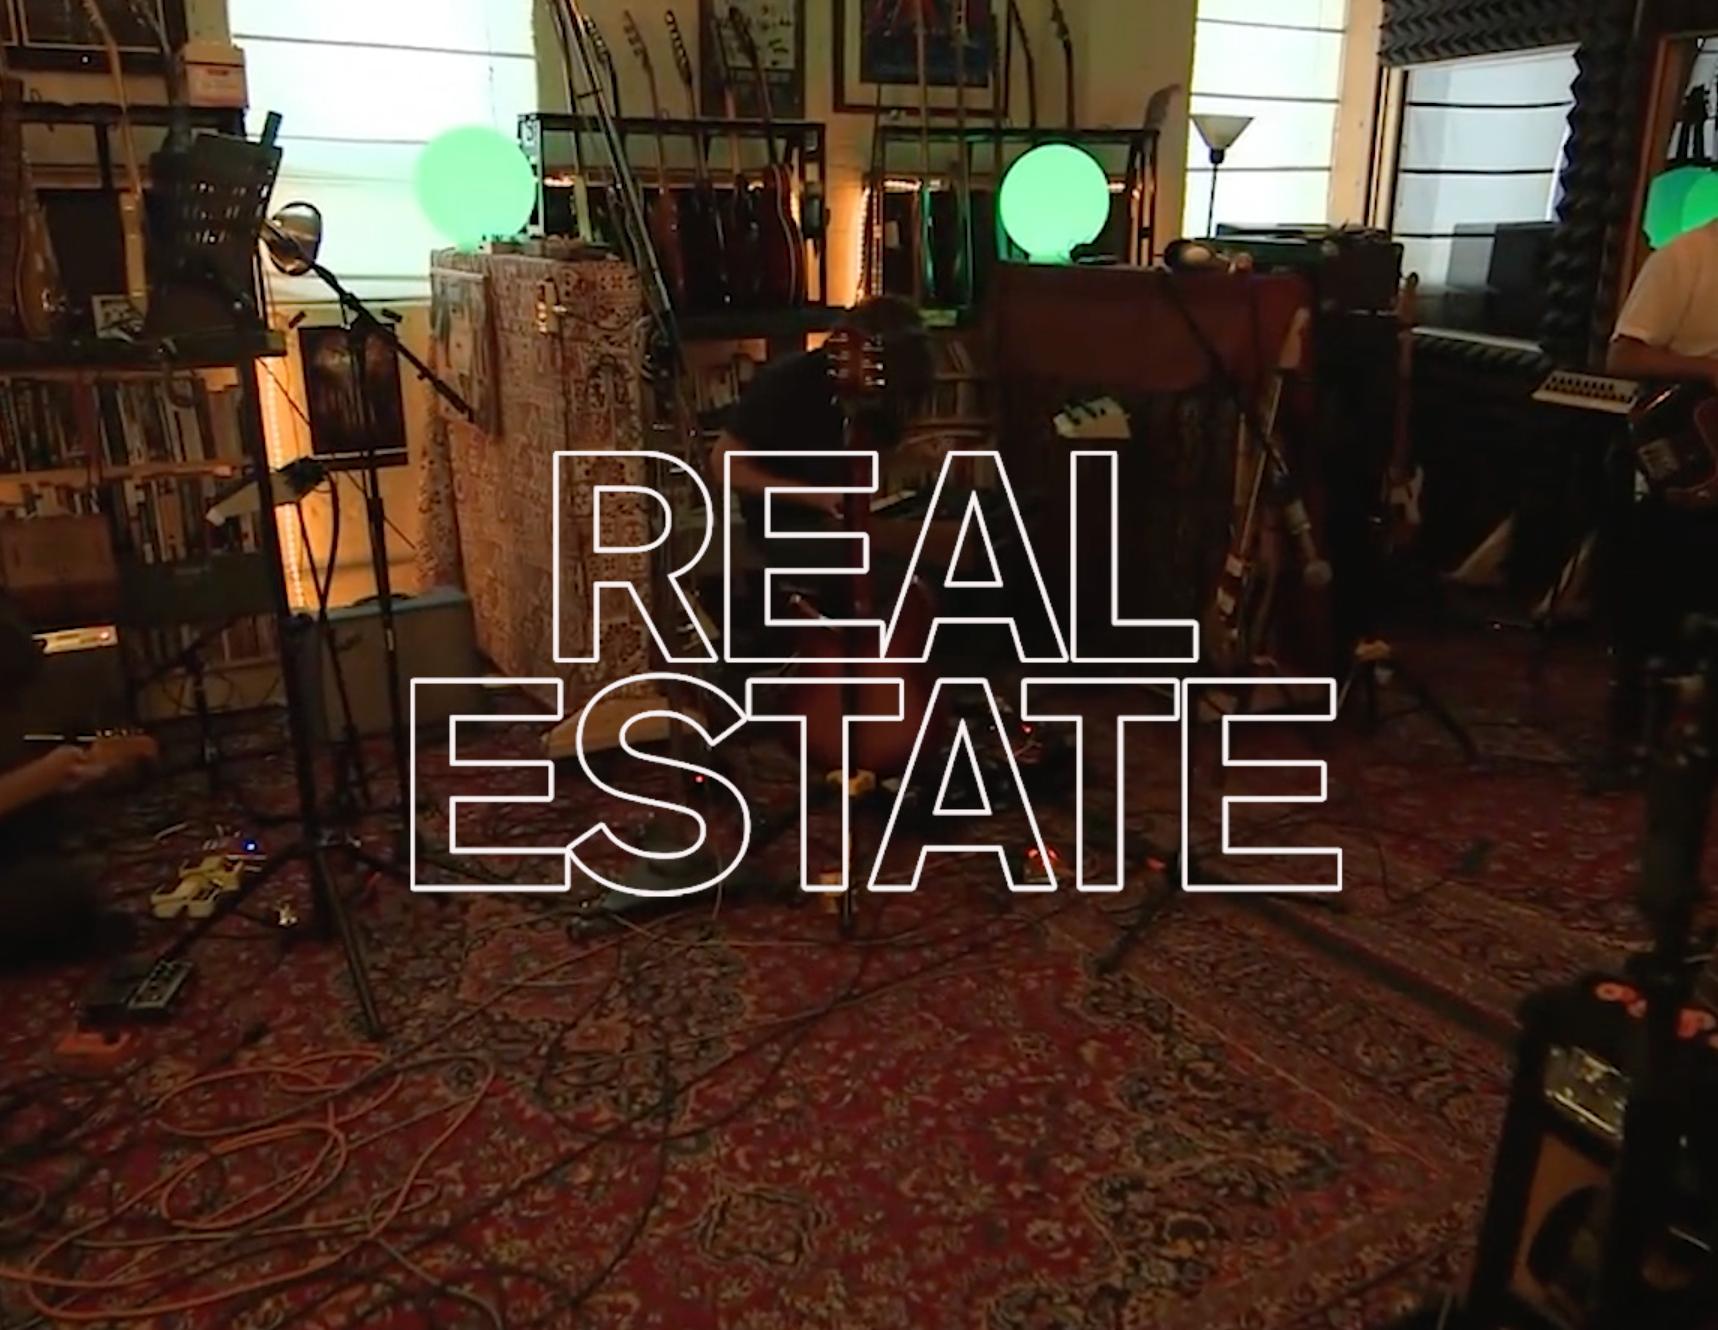 Thumbnail for Real Estate - Quarantour